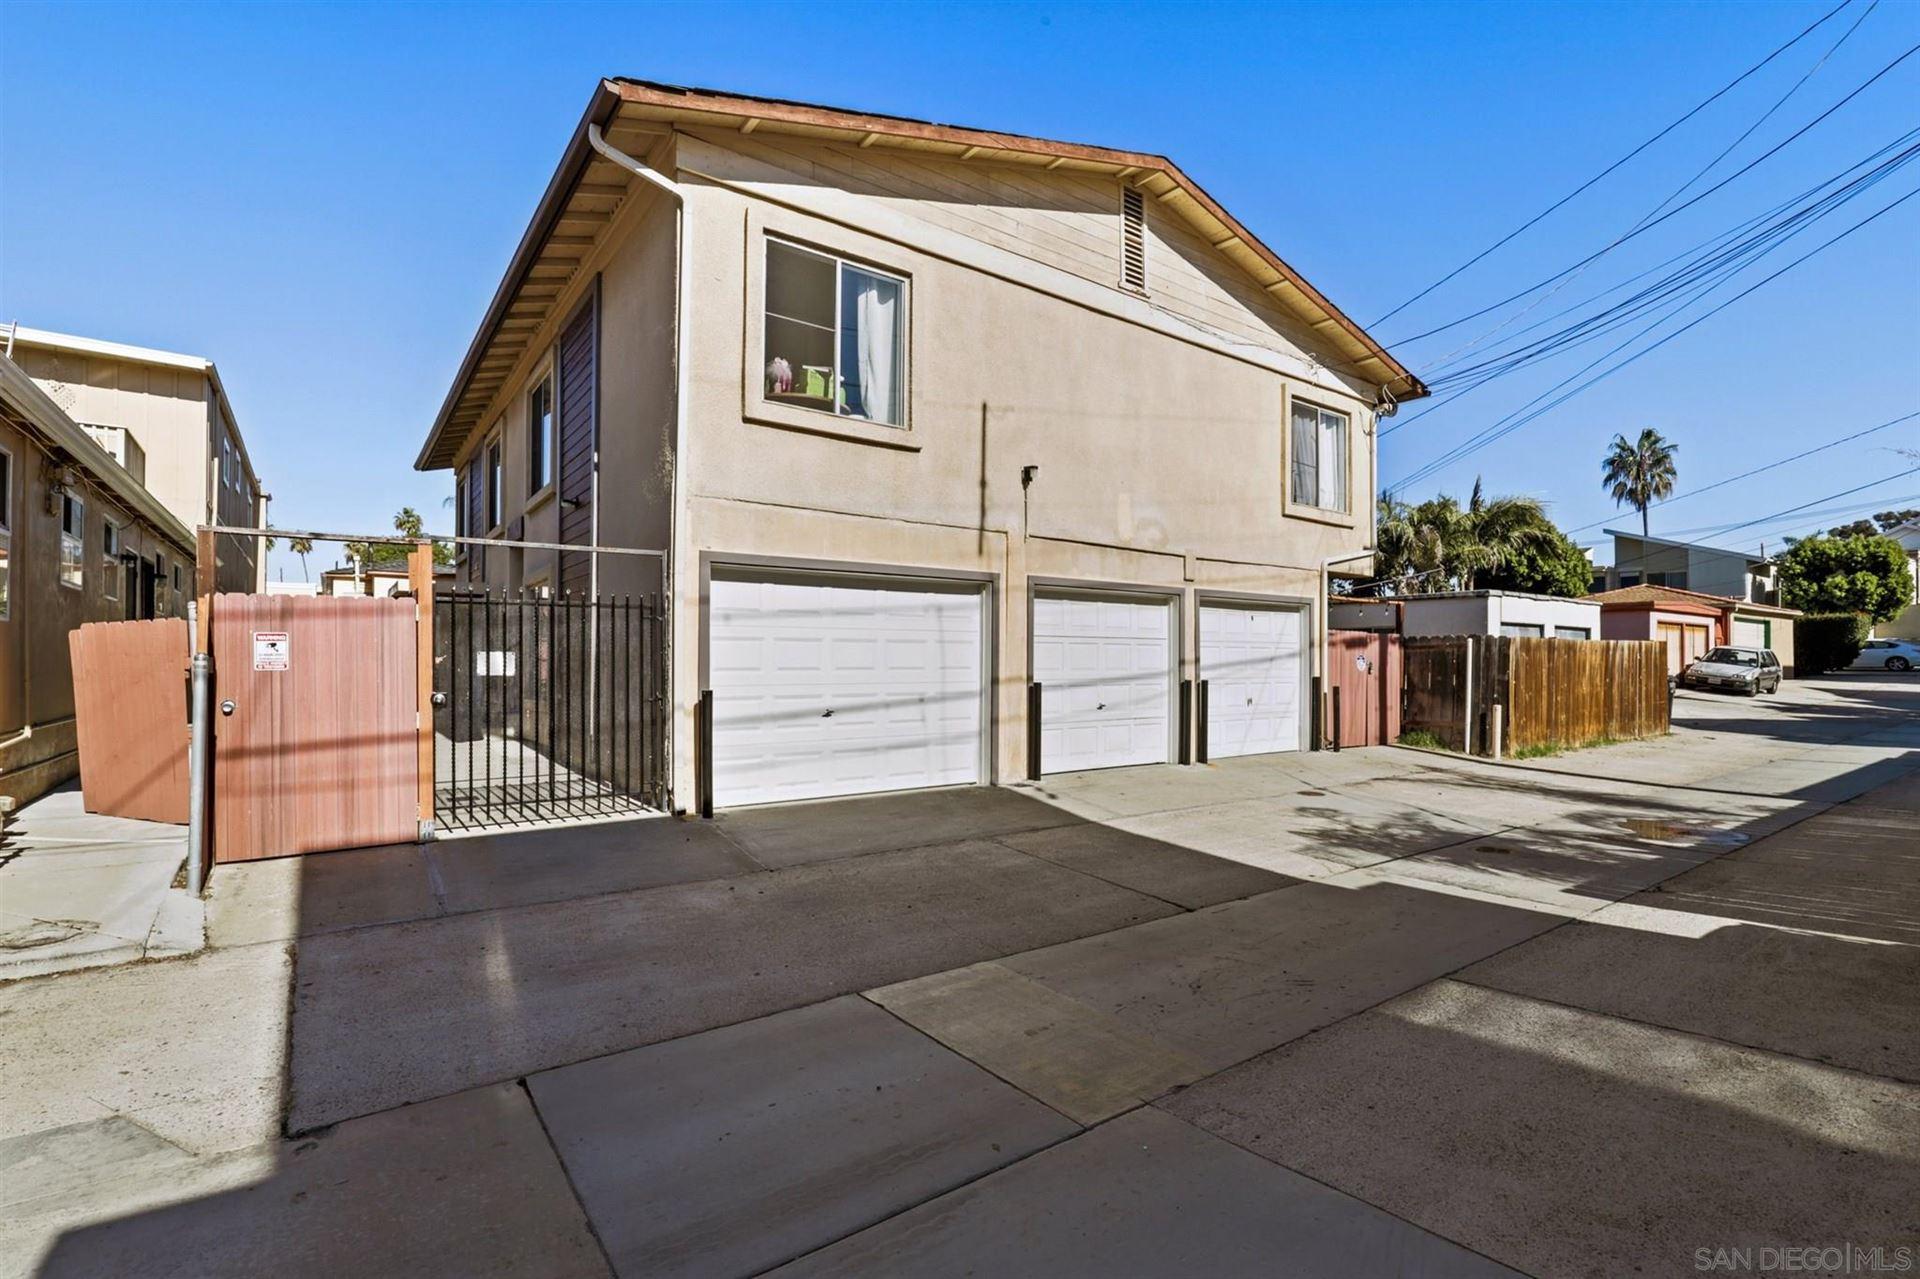 Photo of 1633 Thomas Ave, San Diego, CA 92109 (MLS # 200052203)